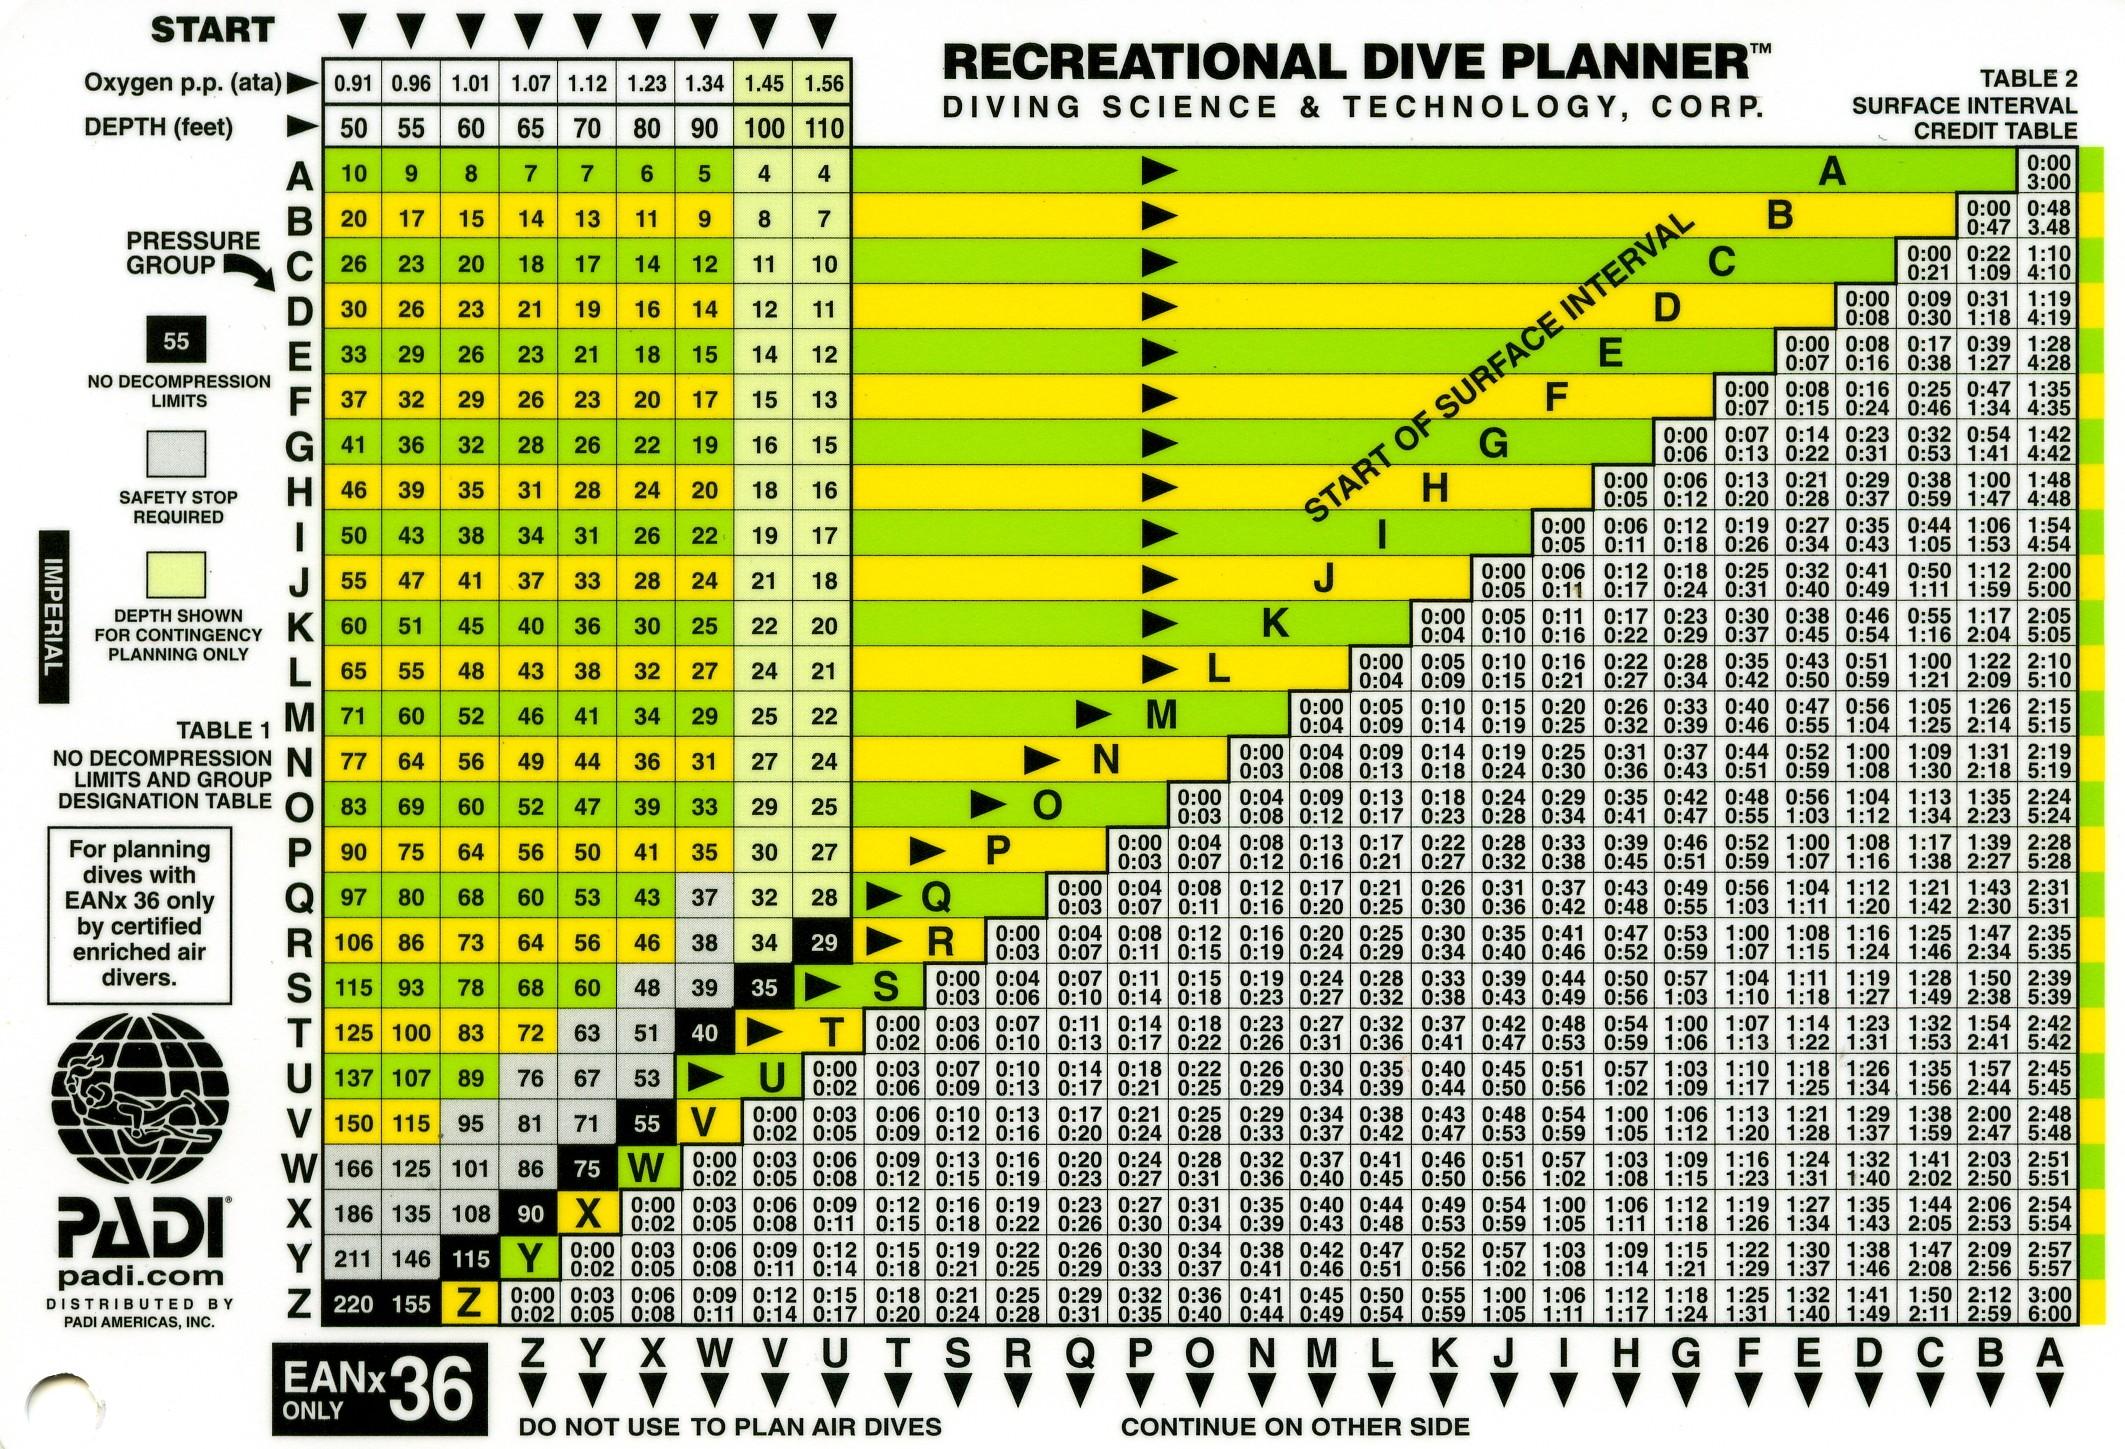 Padi rdp table pdf